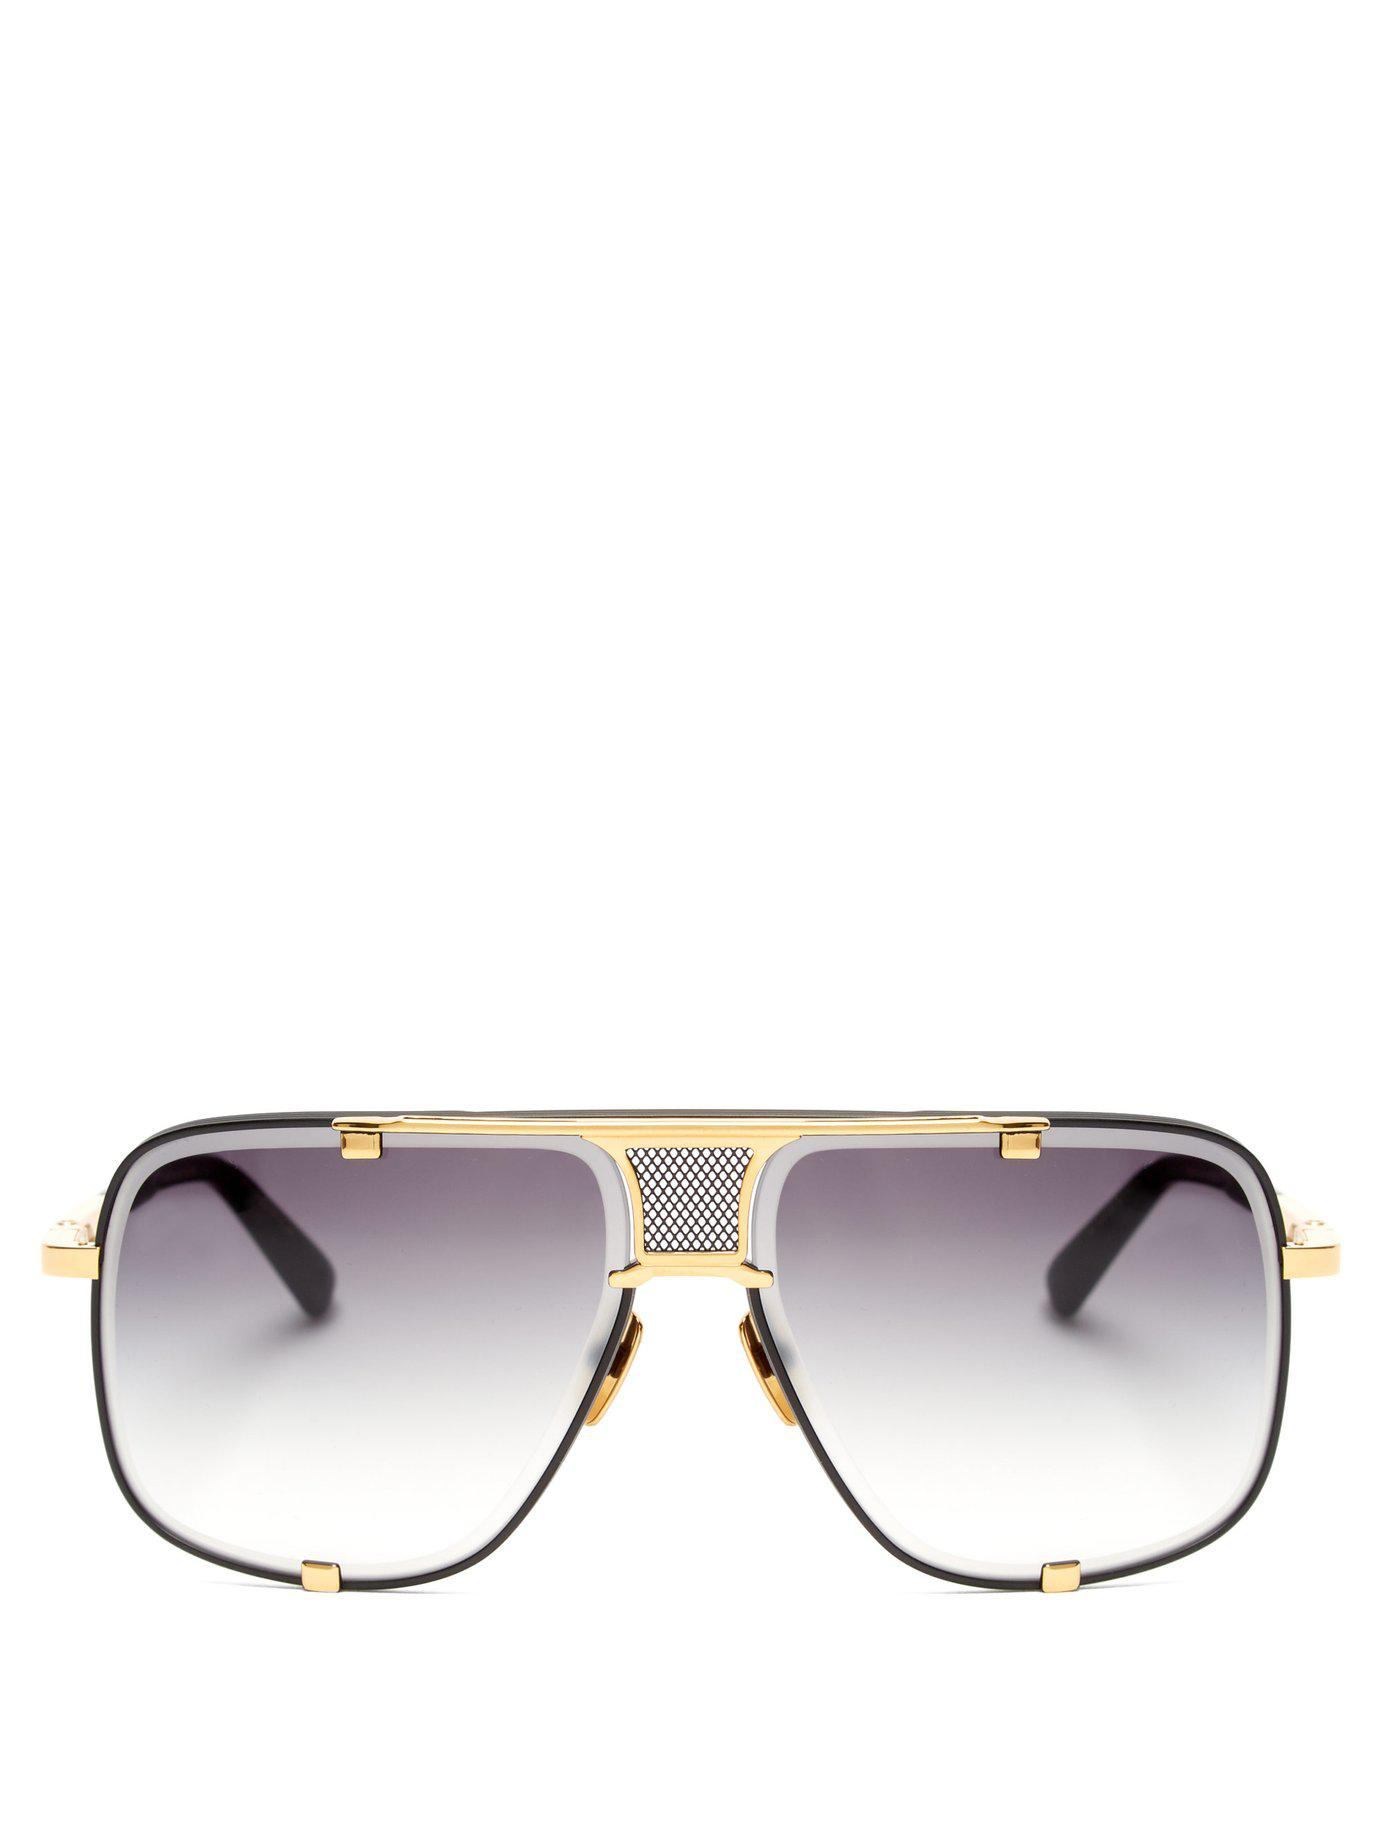 e5ea8e28e1b7 Lyst - Dita Eyewear Mach Five Aviator Sunglasses in Black for Men